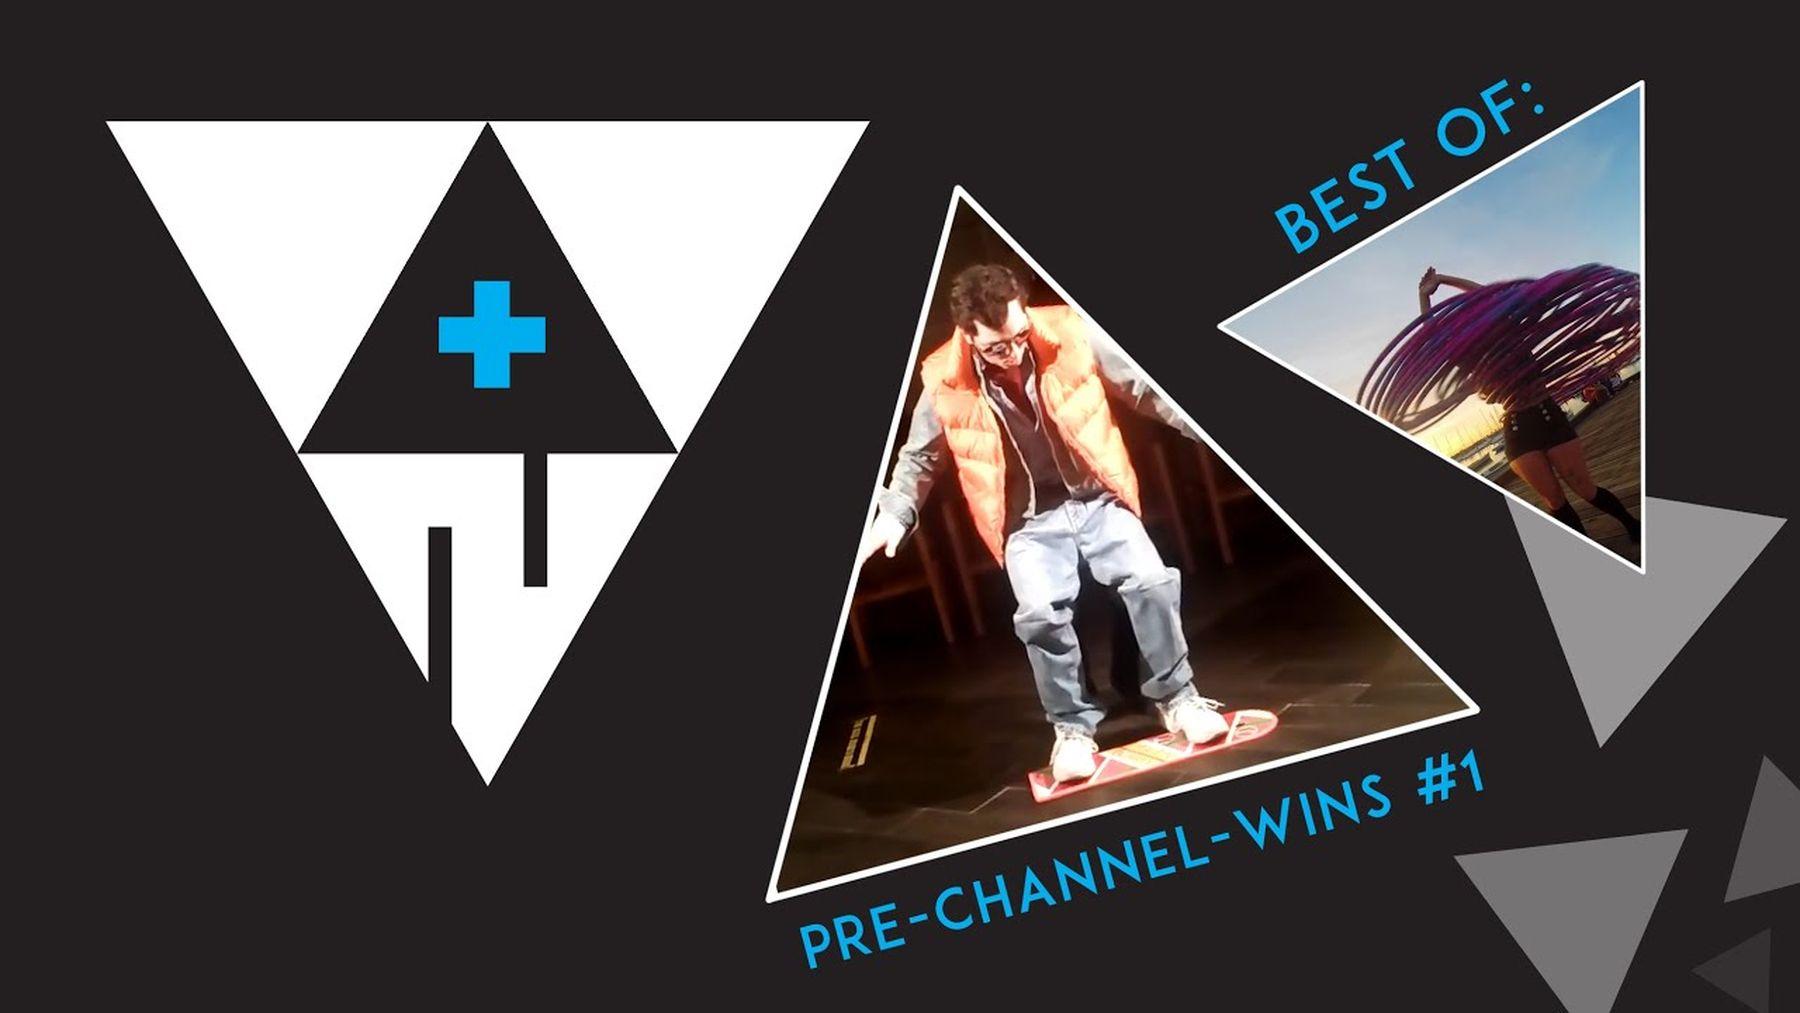 Bonus Win-Compilation: Best of Pre-Channel Videos #1 | Win-Compilation | Was is hier eigentlich los?